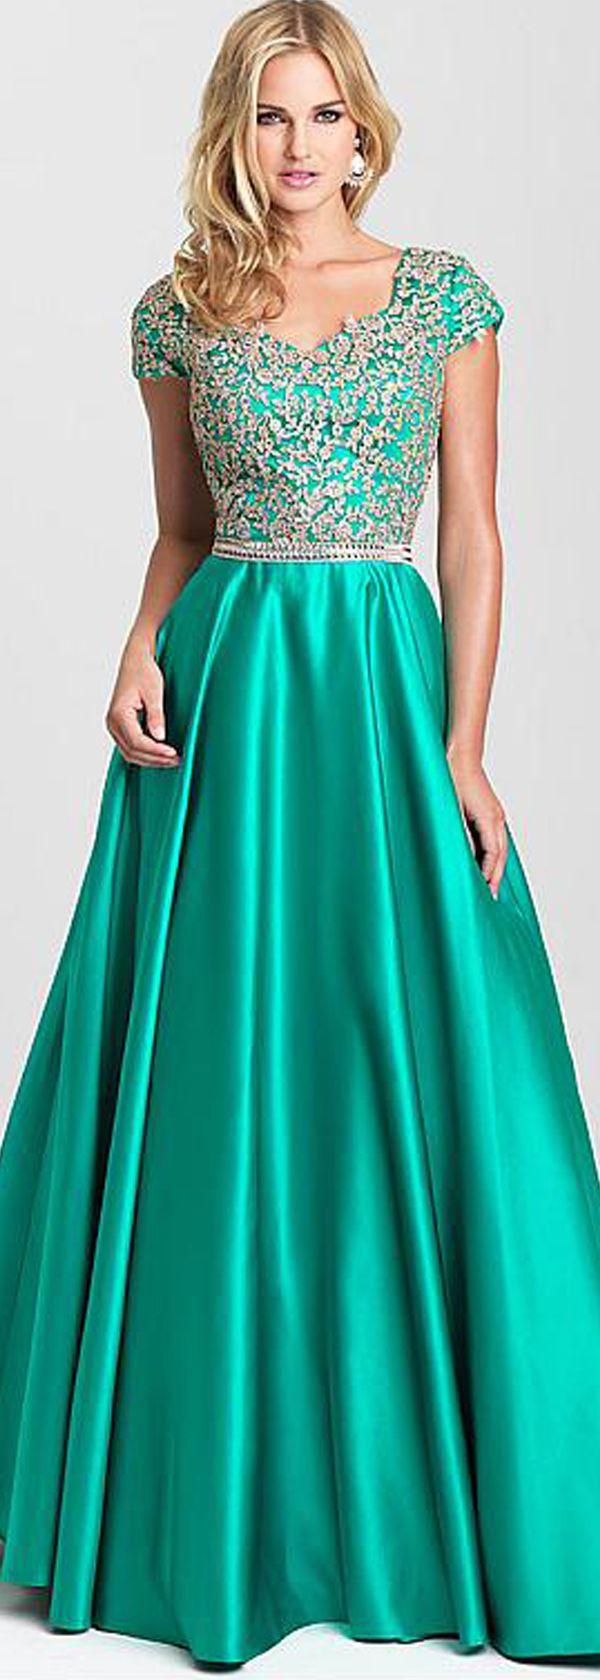 447 best Prom Dress images on Pinterest